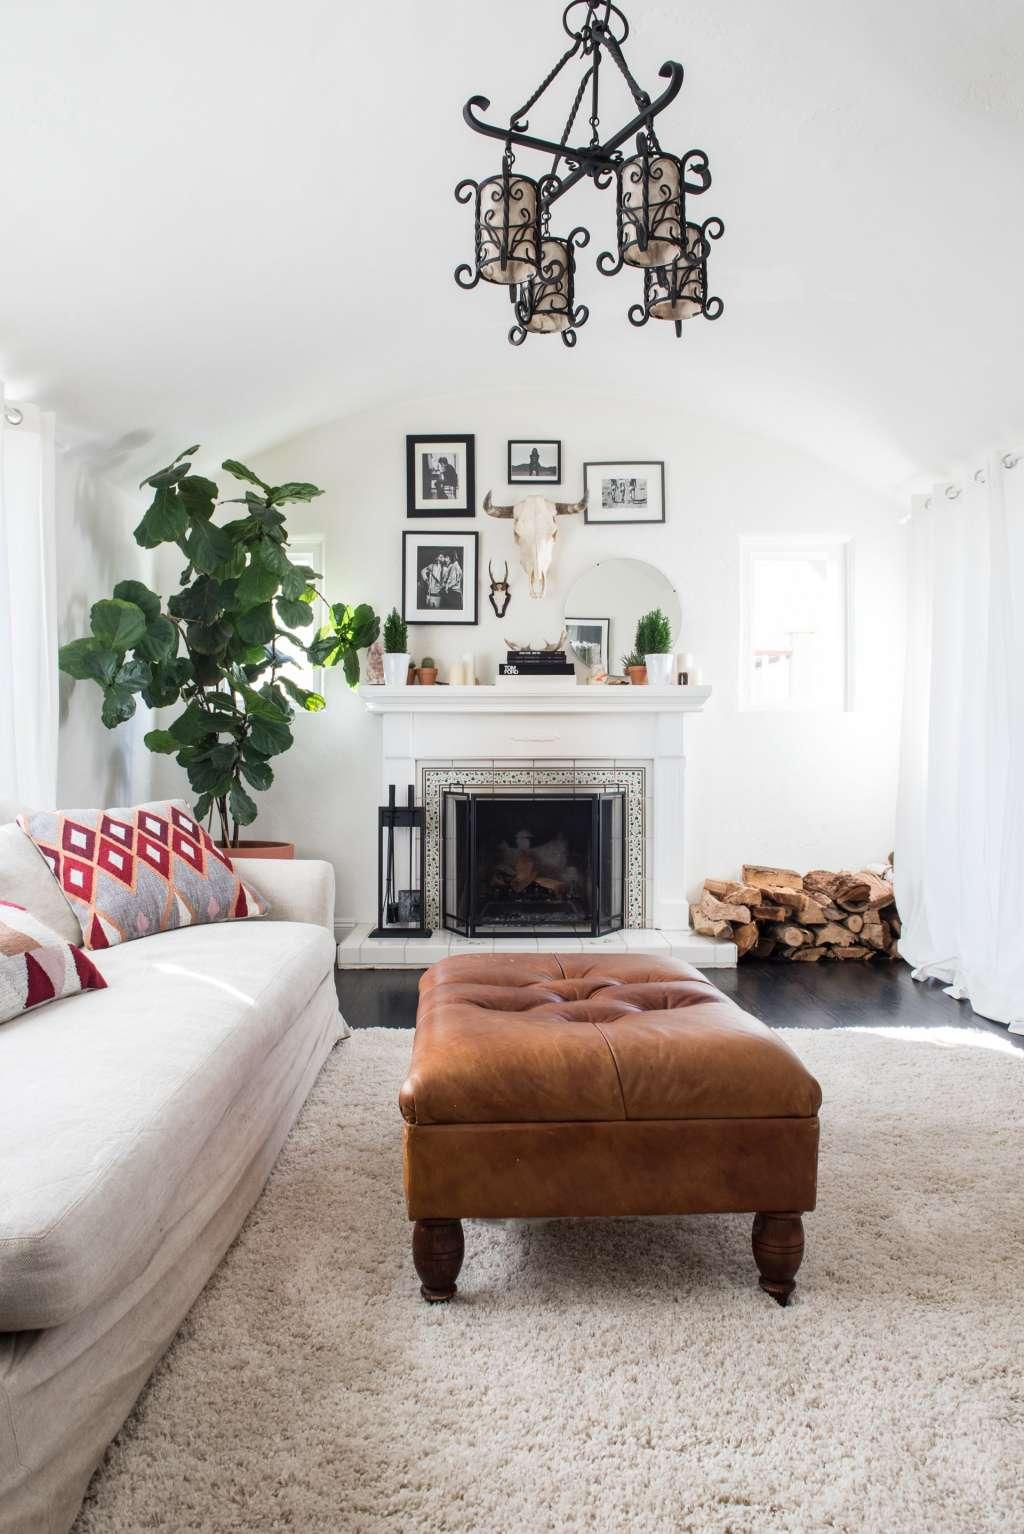 House Tour: A Cozy, Laid-Back California House